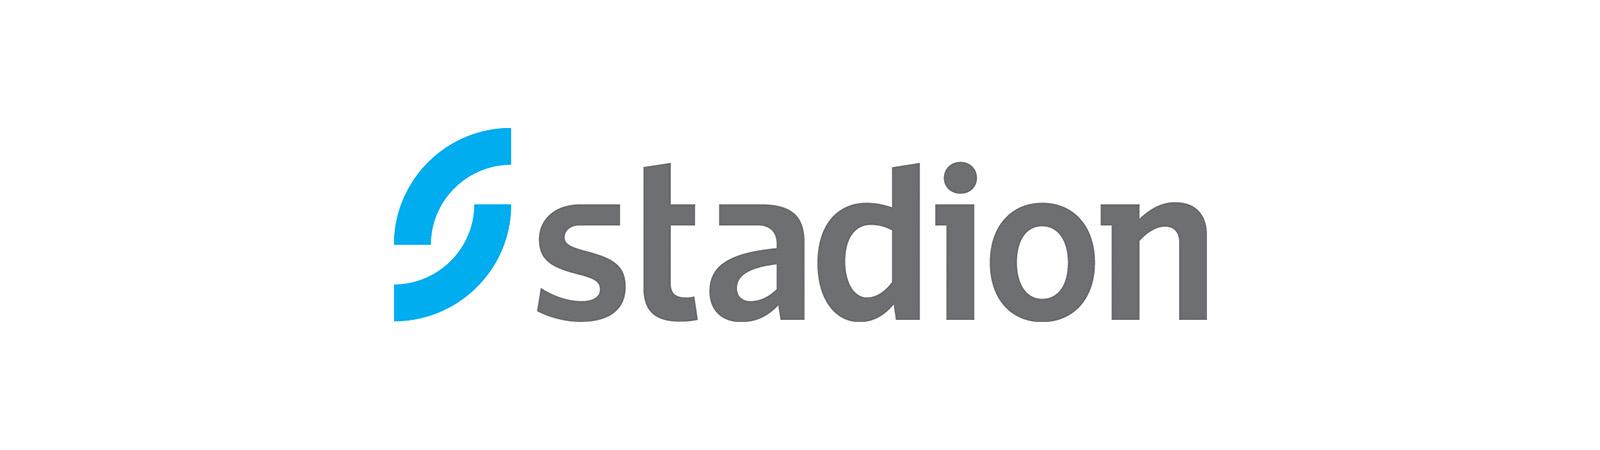 stadion money logo.jpg